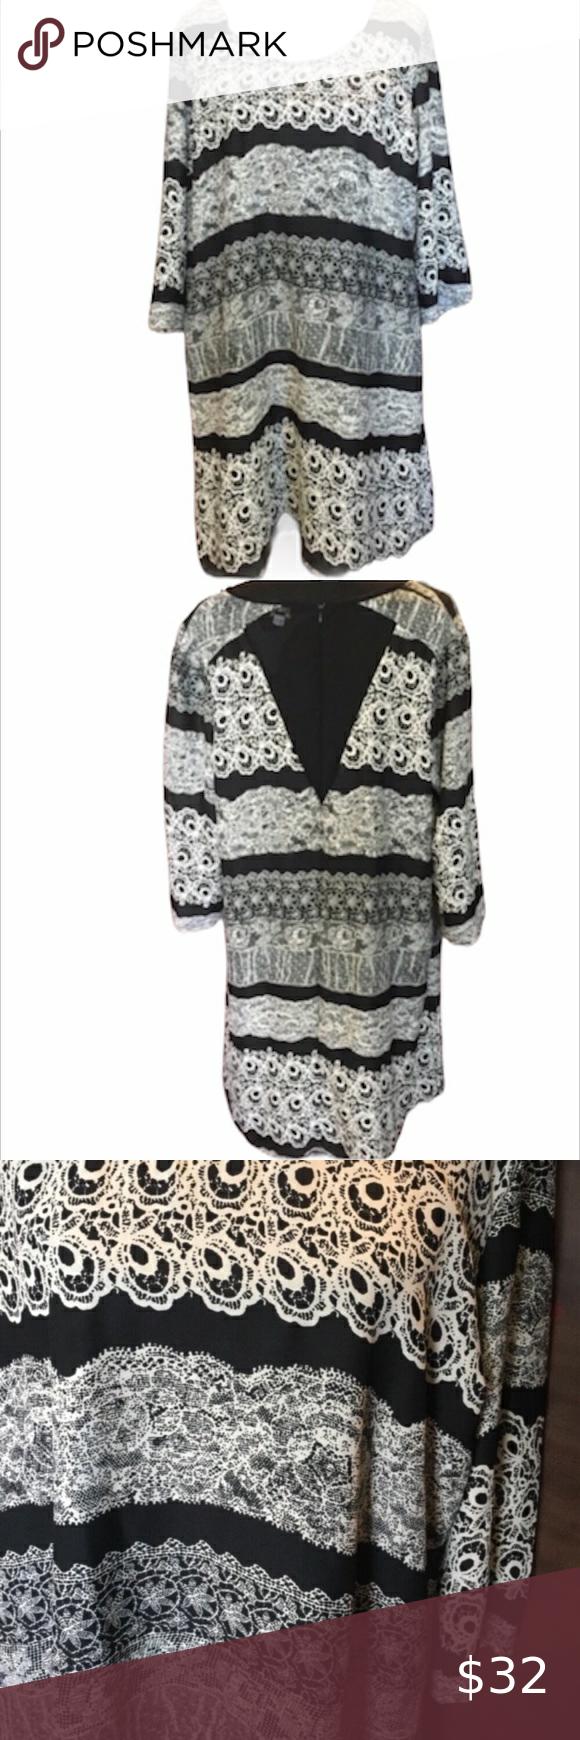 Grazia Dress Black And Cream Size 16 Black Dress Size 16 Dresses Clothes Design [ 1740 x 580 Pixel ]